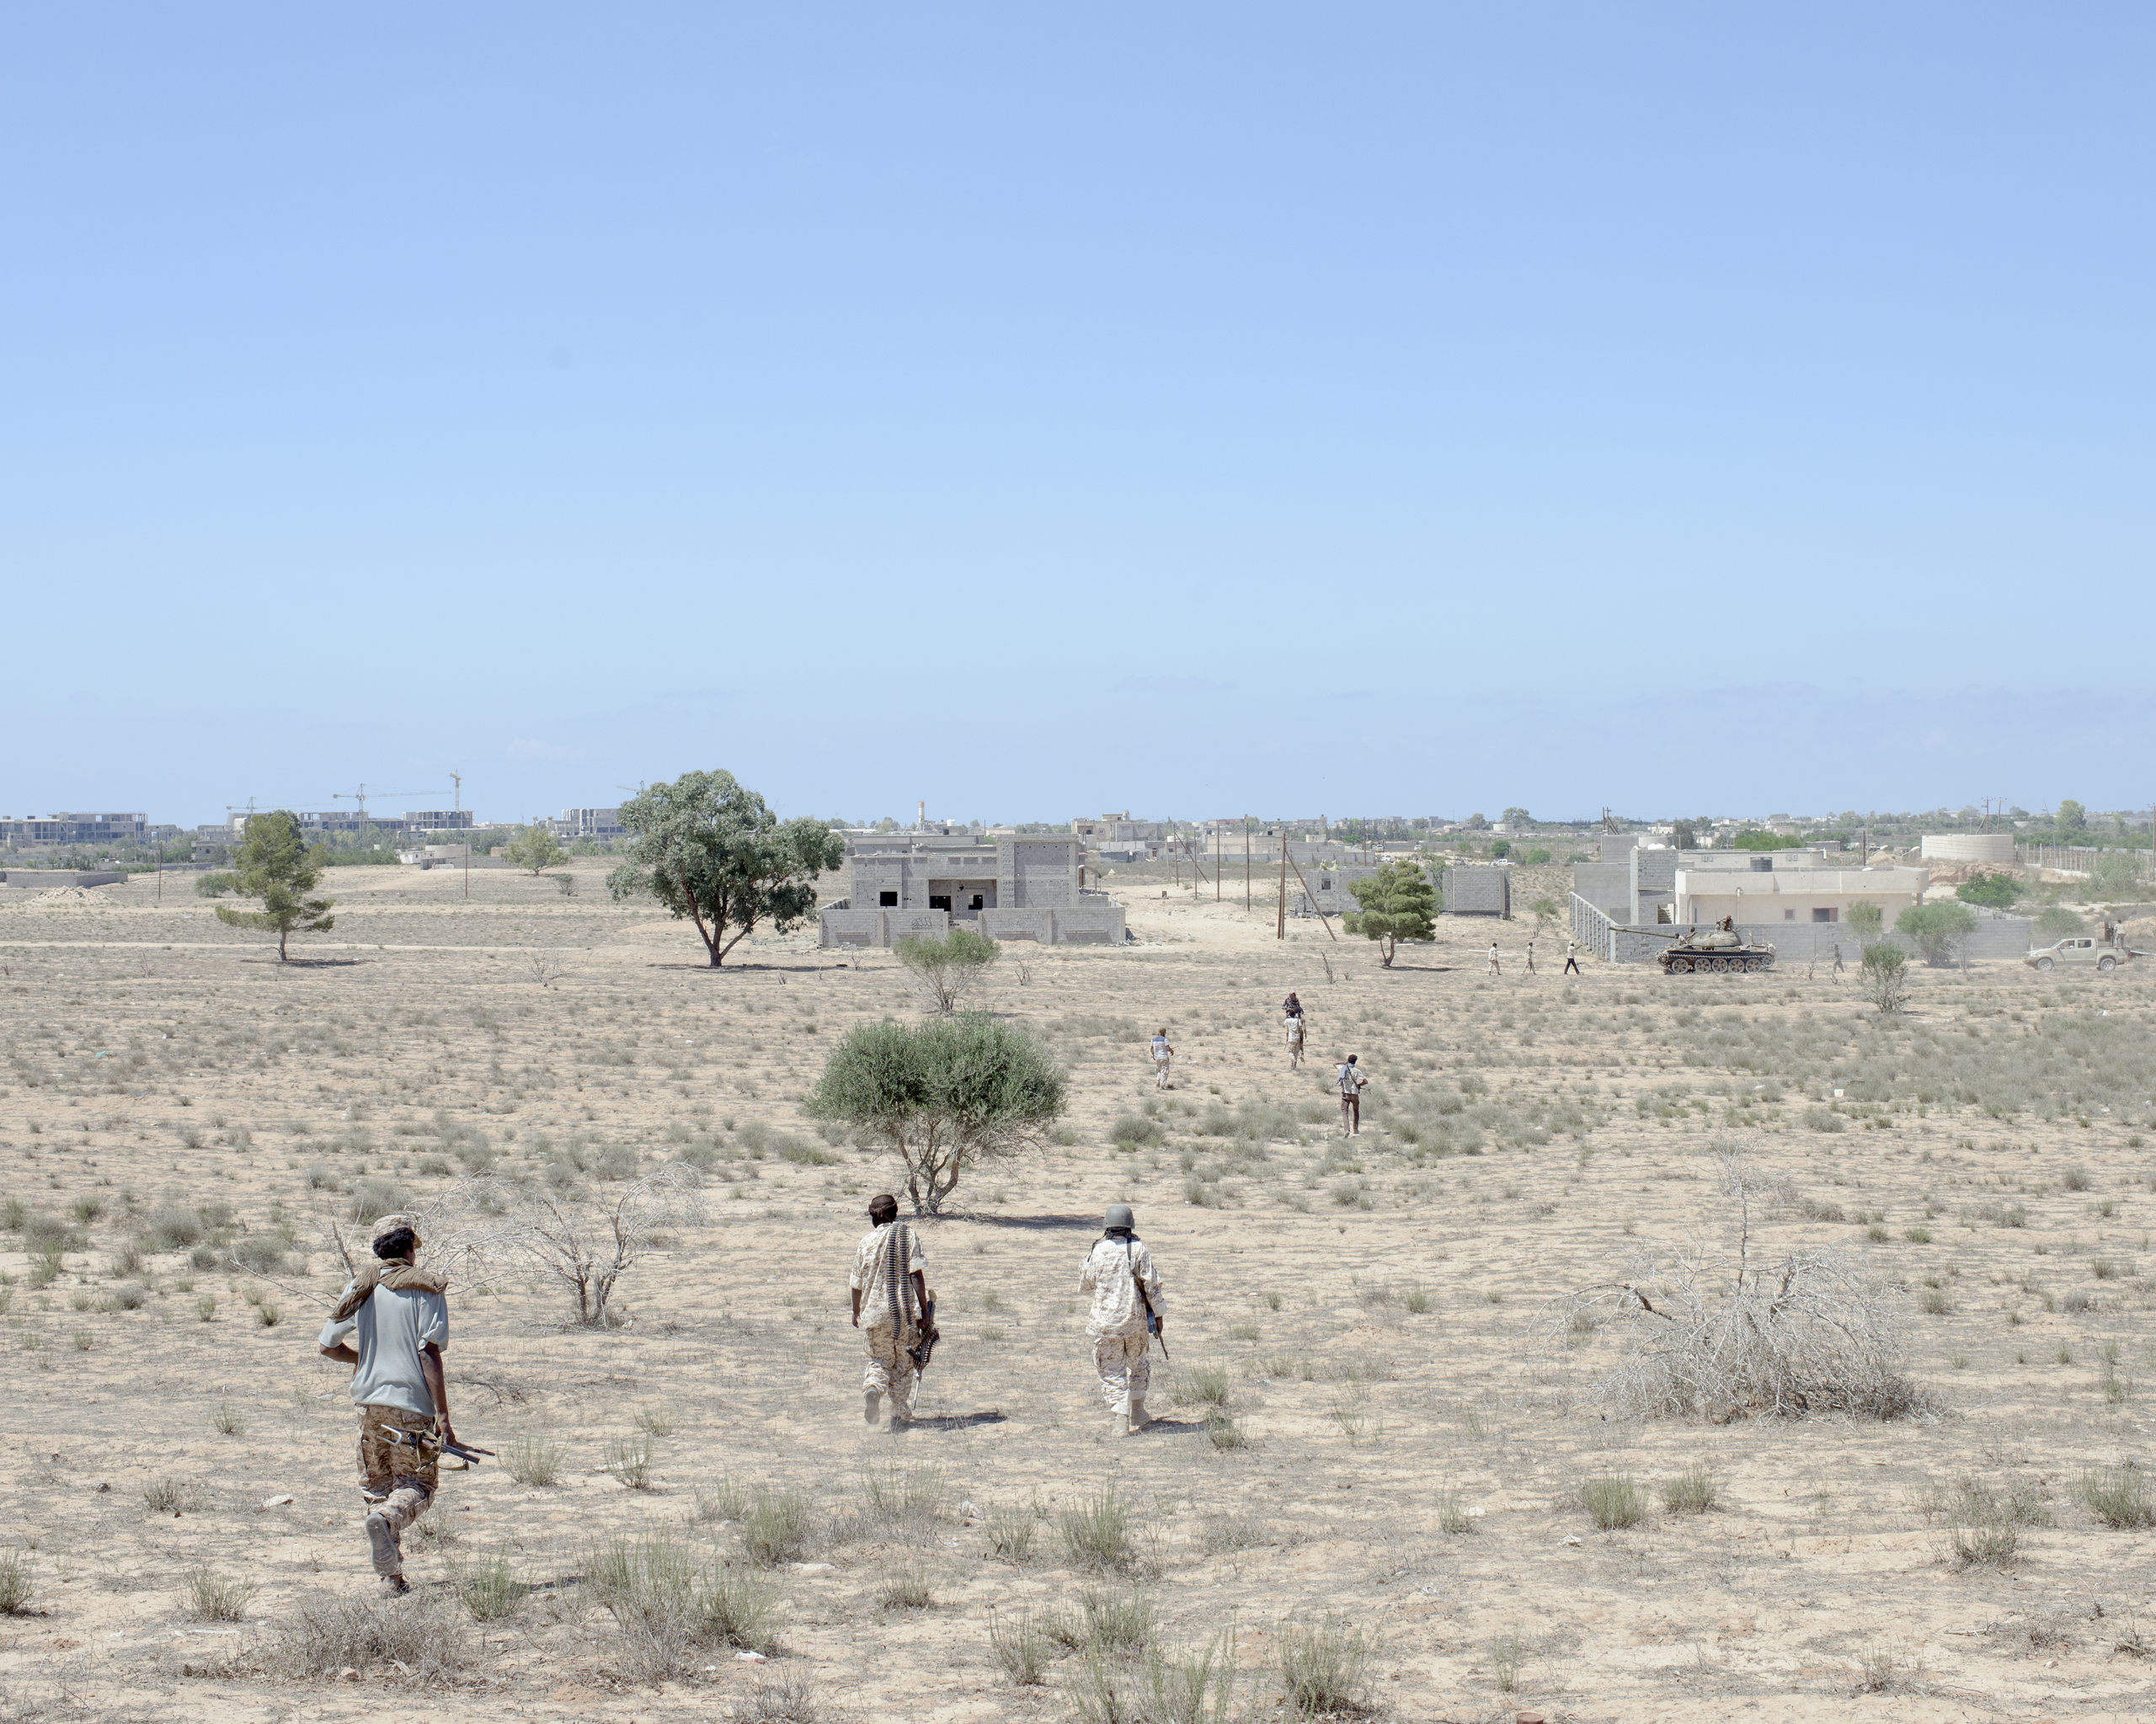 Libyan fighters advance through a minefield in the Abu Hadi district, Sirt, Libya, July 2016.